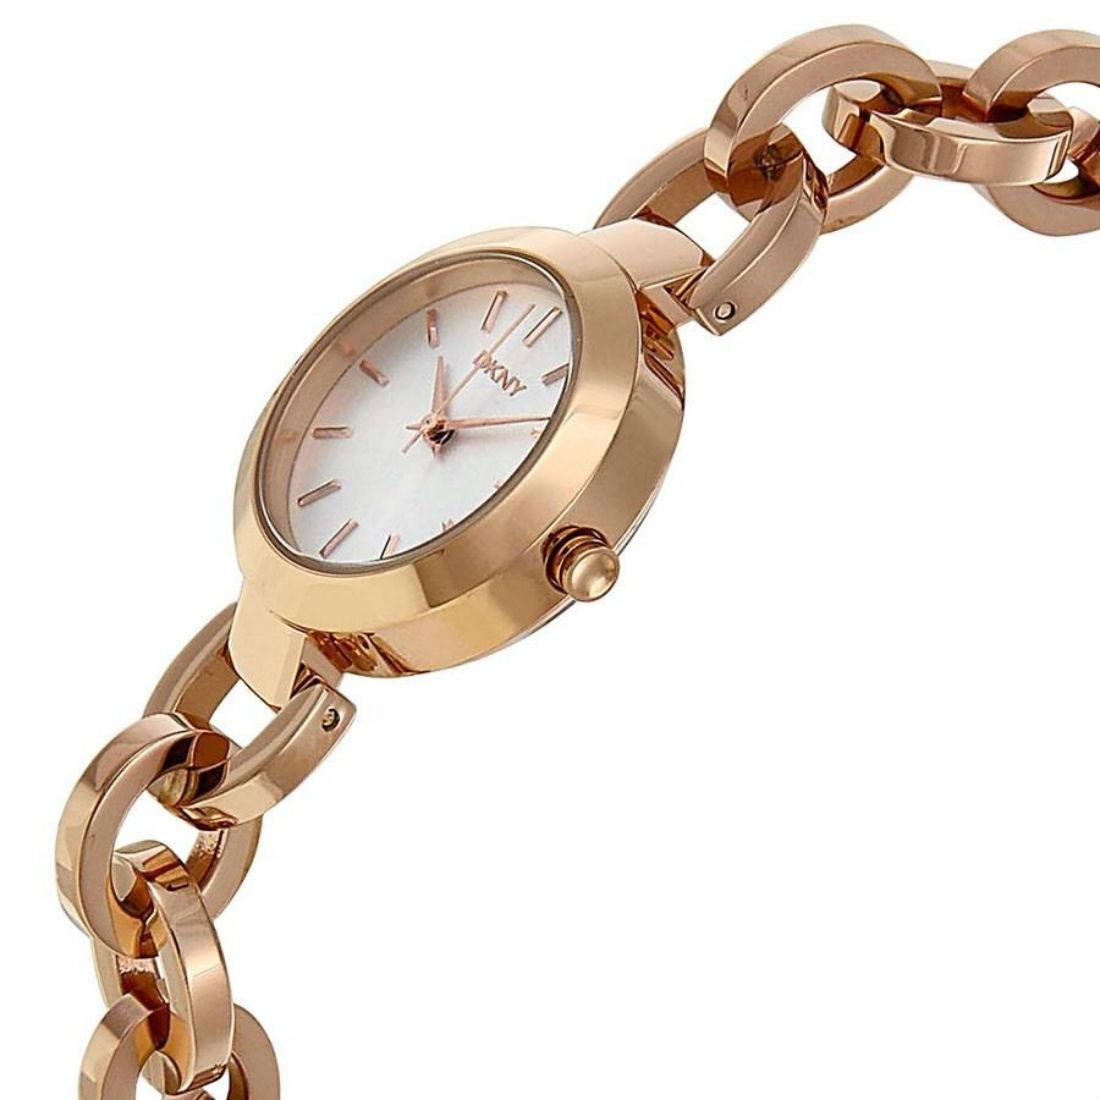 d757732f4e1 Relógio Feminino Analógico Dkny